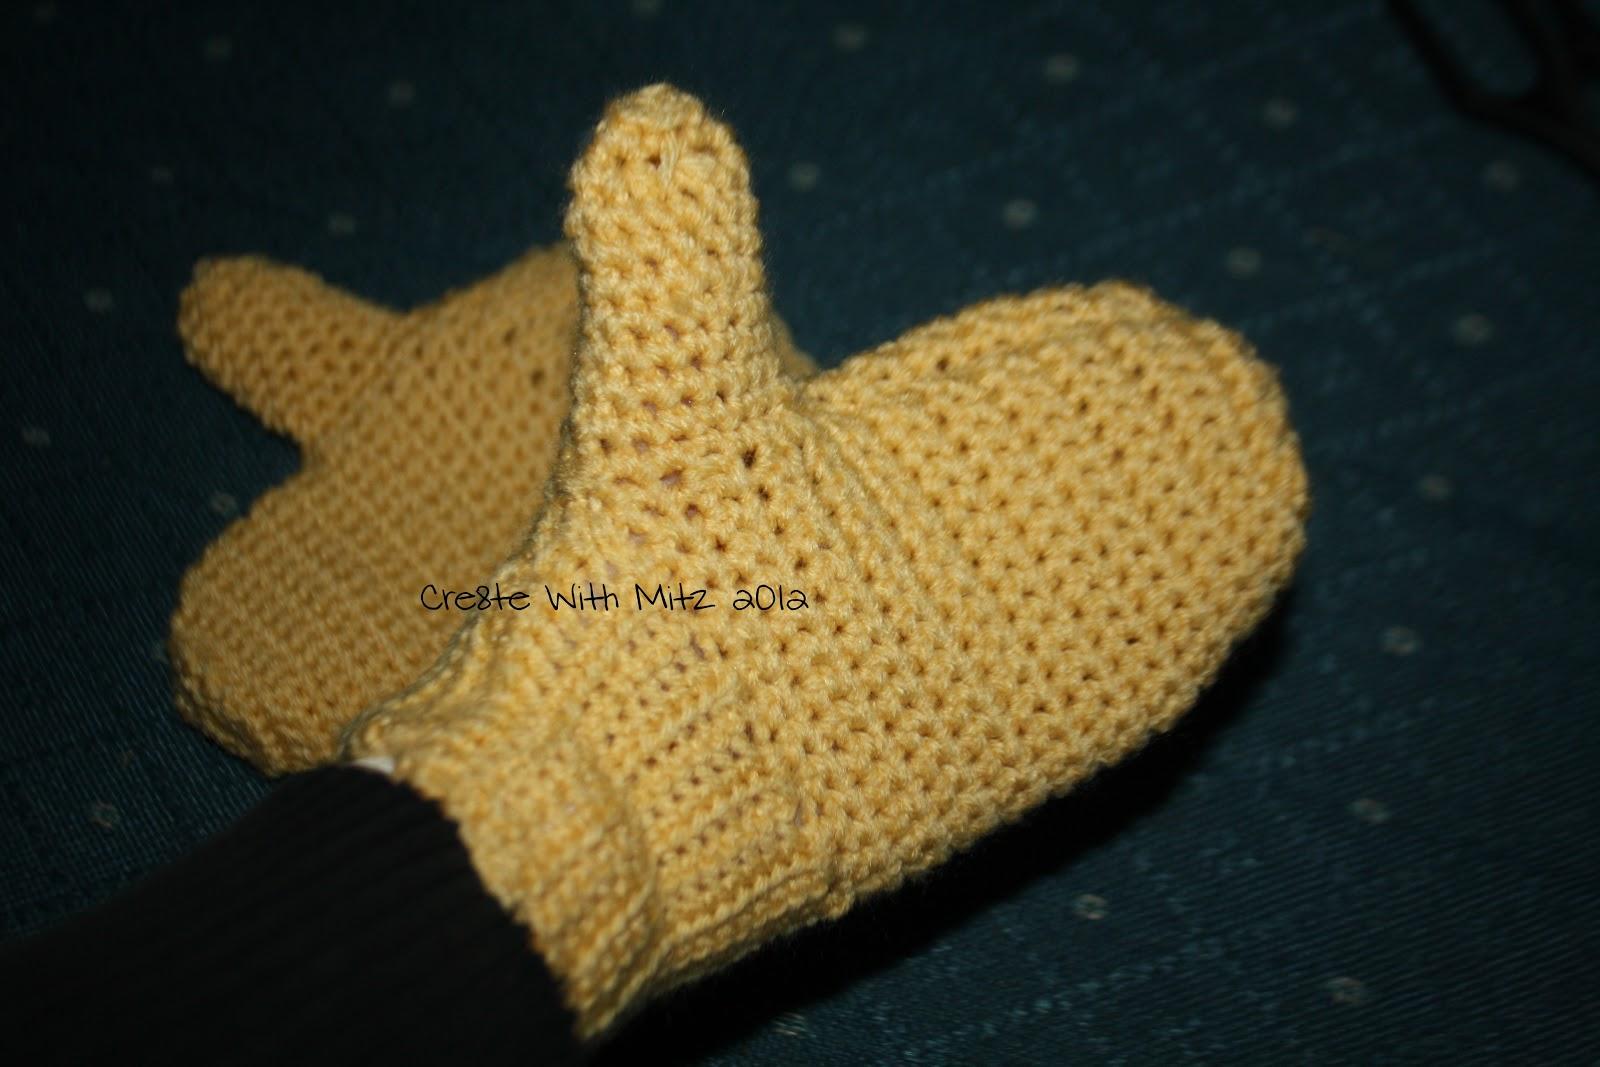 Crochet Cre8tions